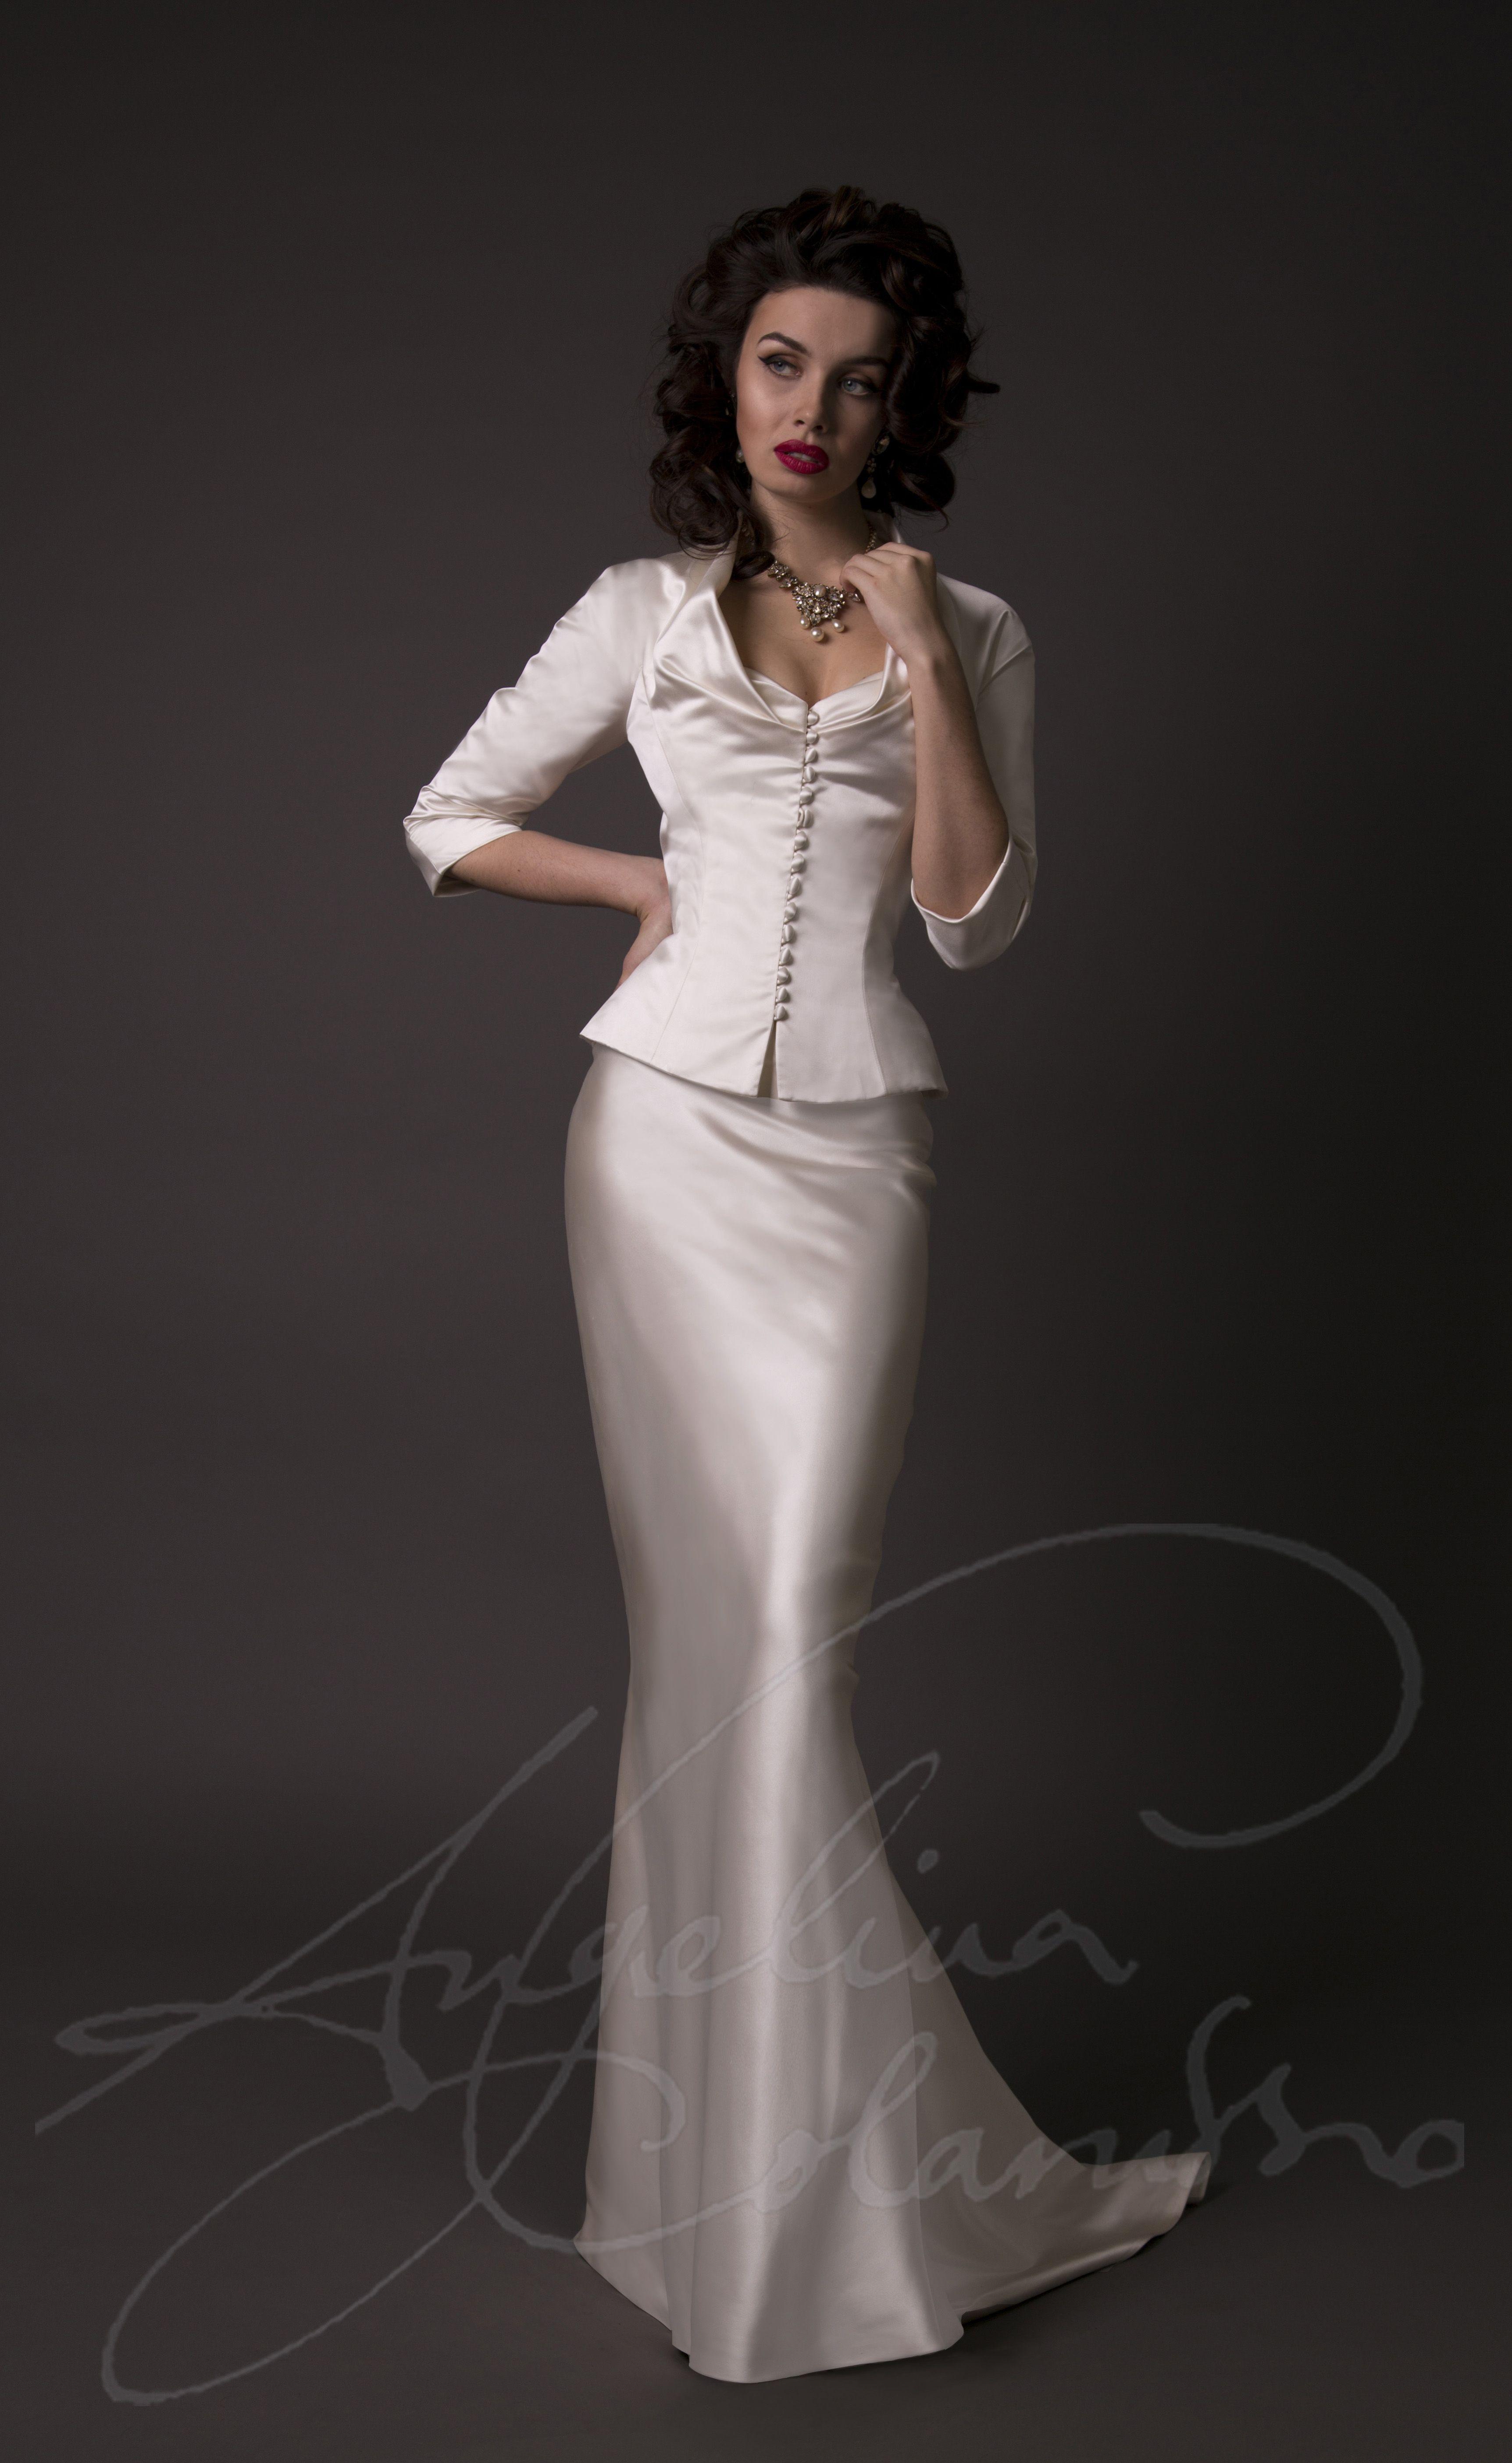 Designer wedding gown by couture bridal designer Angelina ...